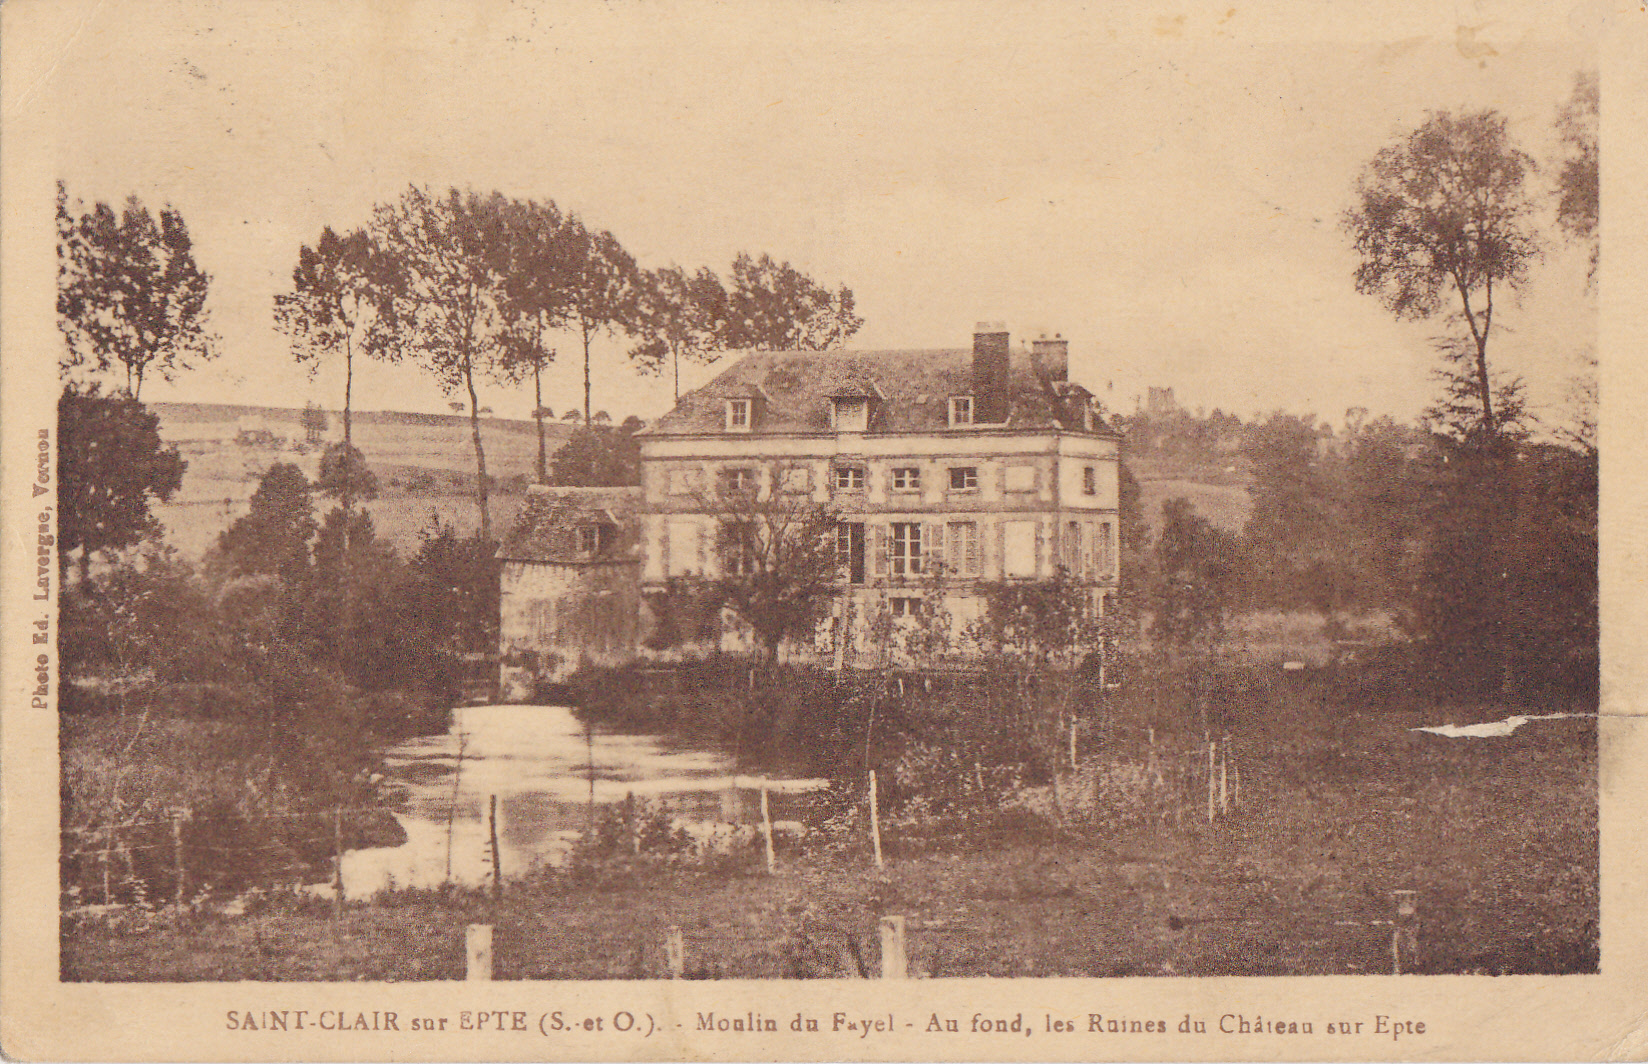 Moulin du Fayel